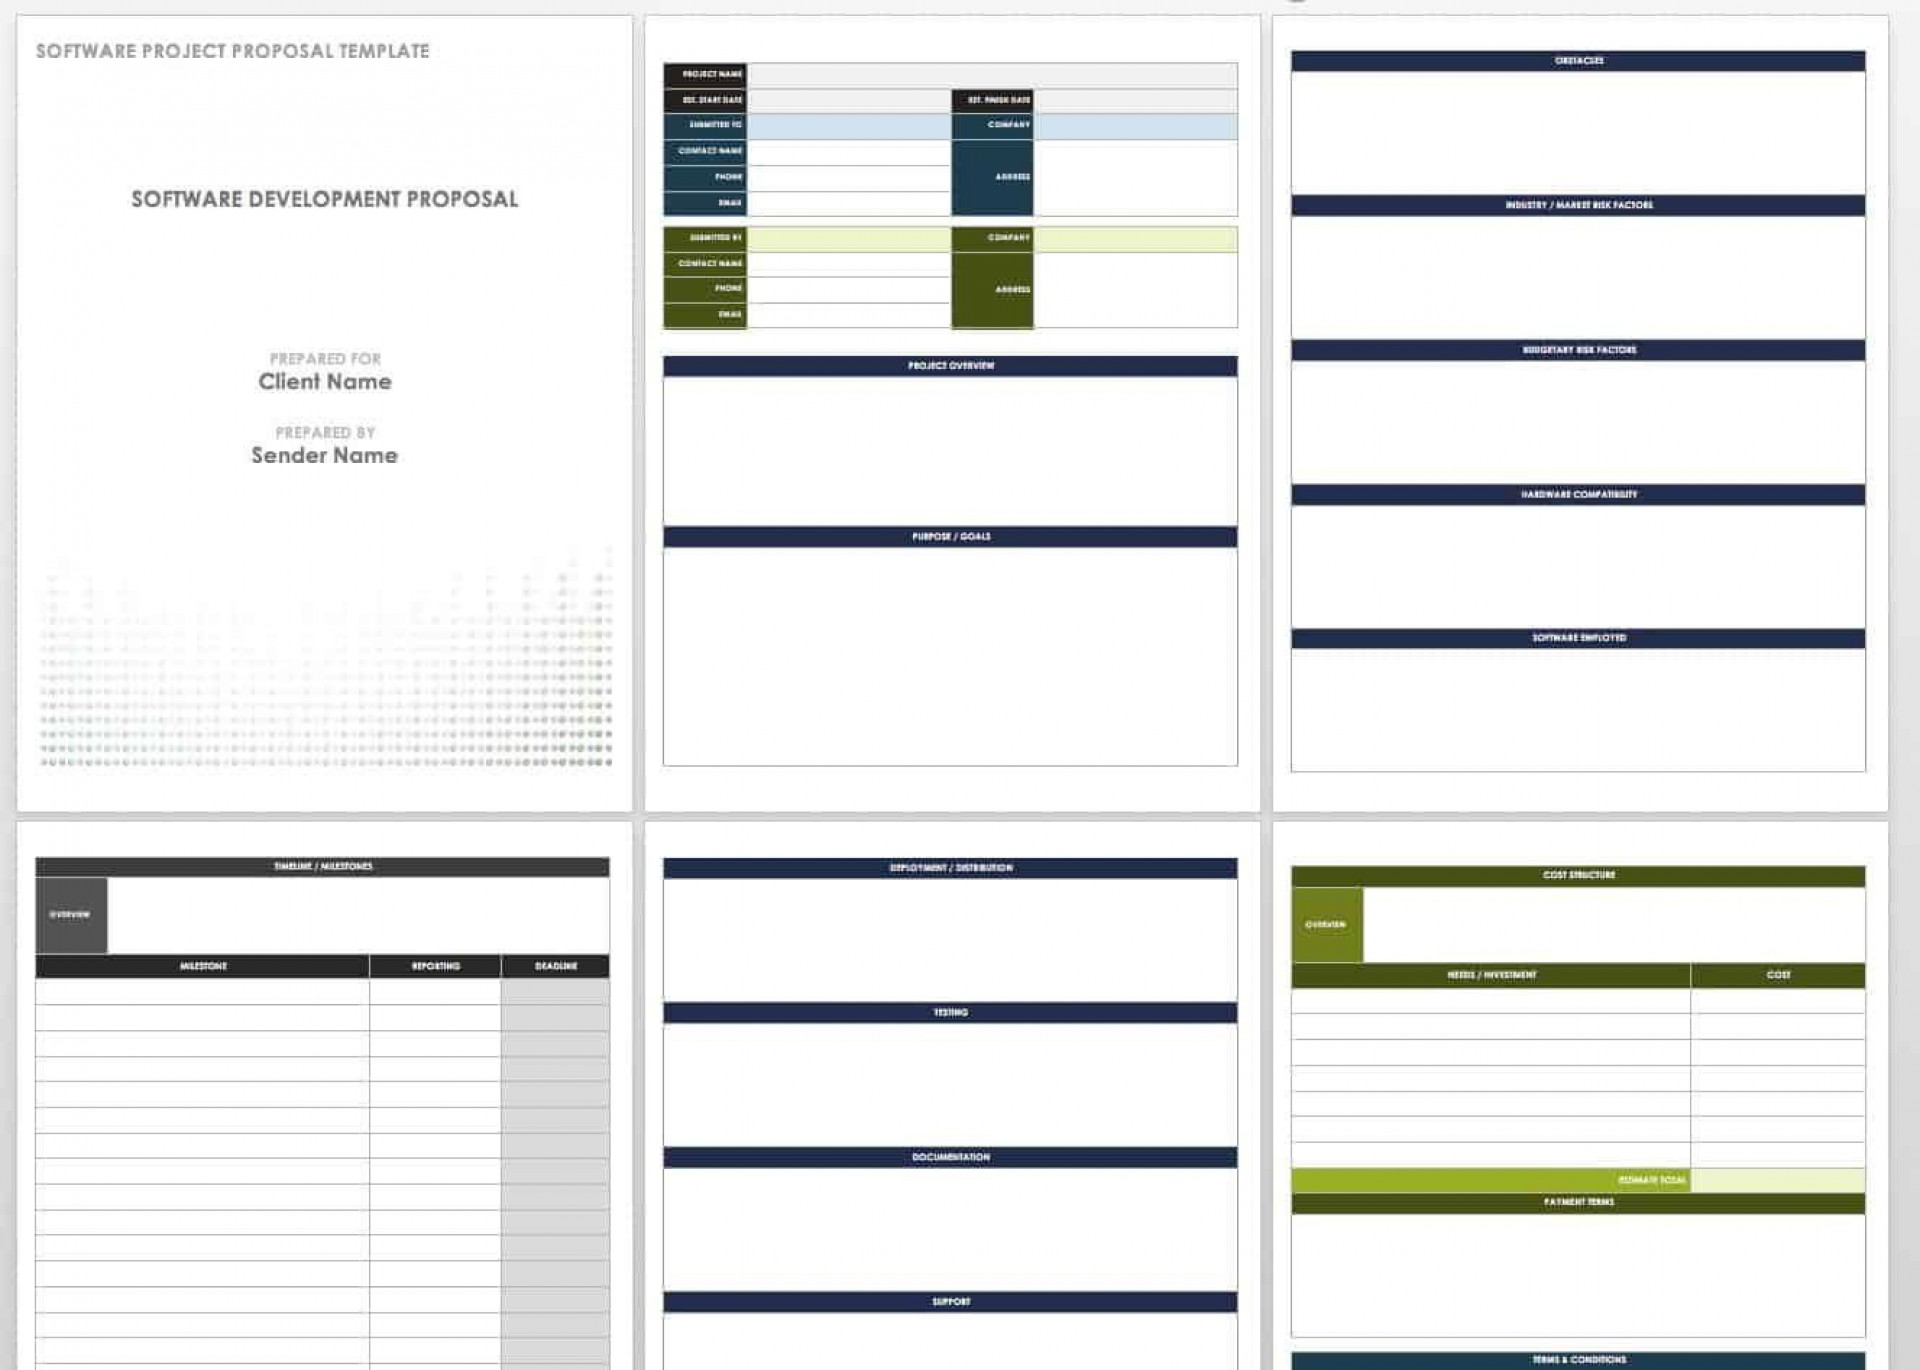 006 Fantastic Web Design Proposal Template Free Download Concept 1920